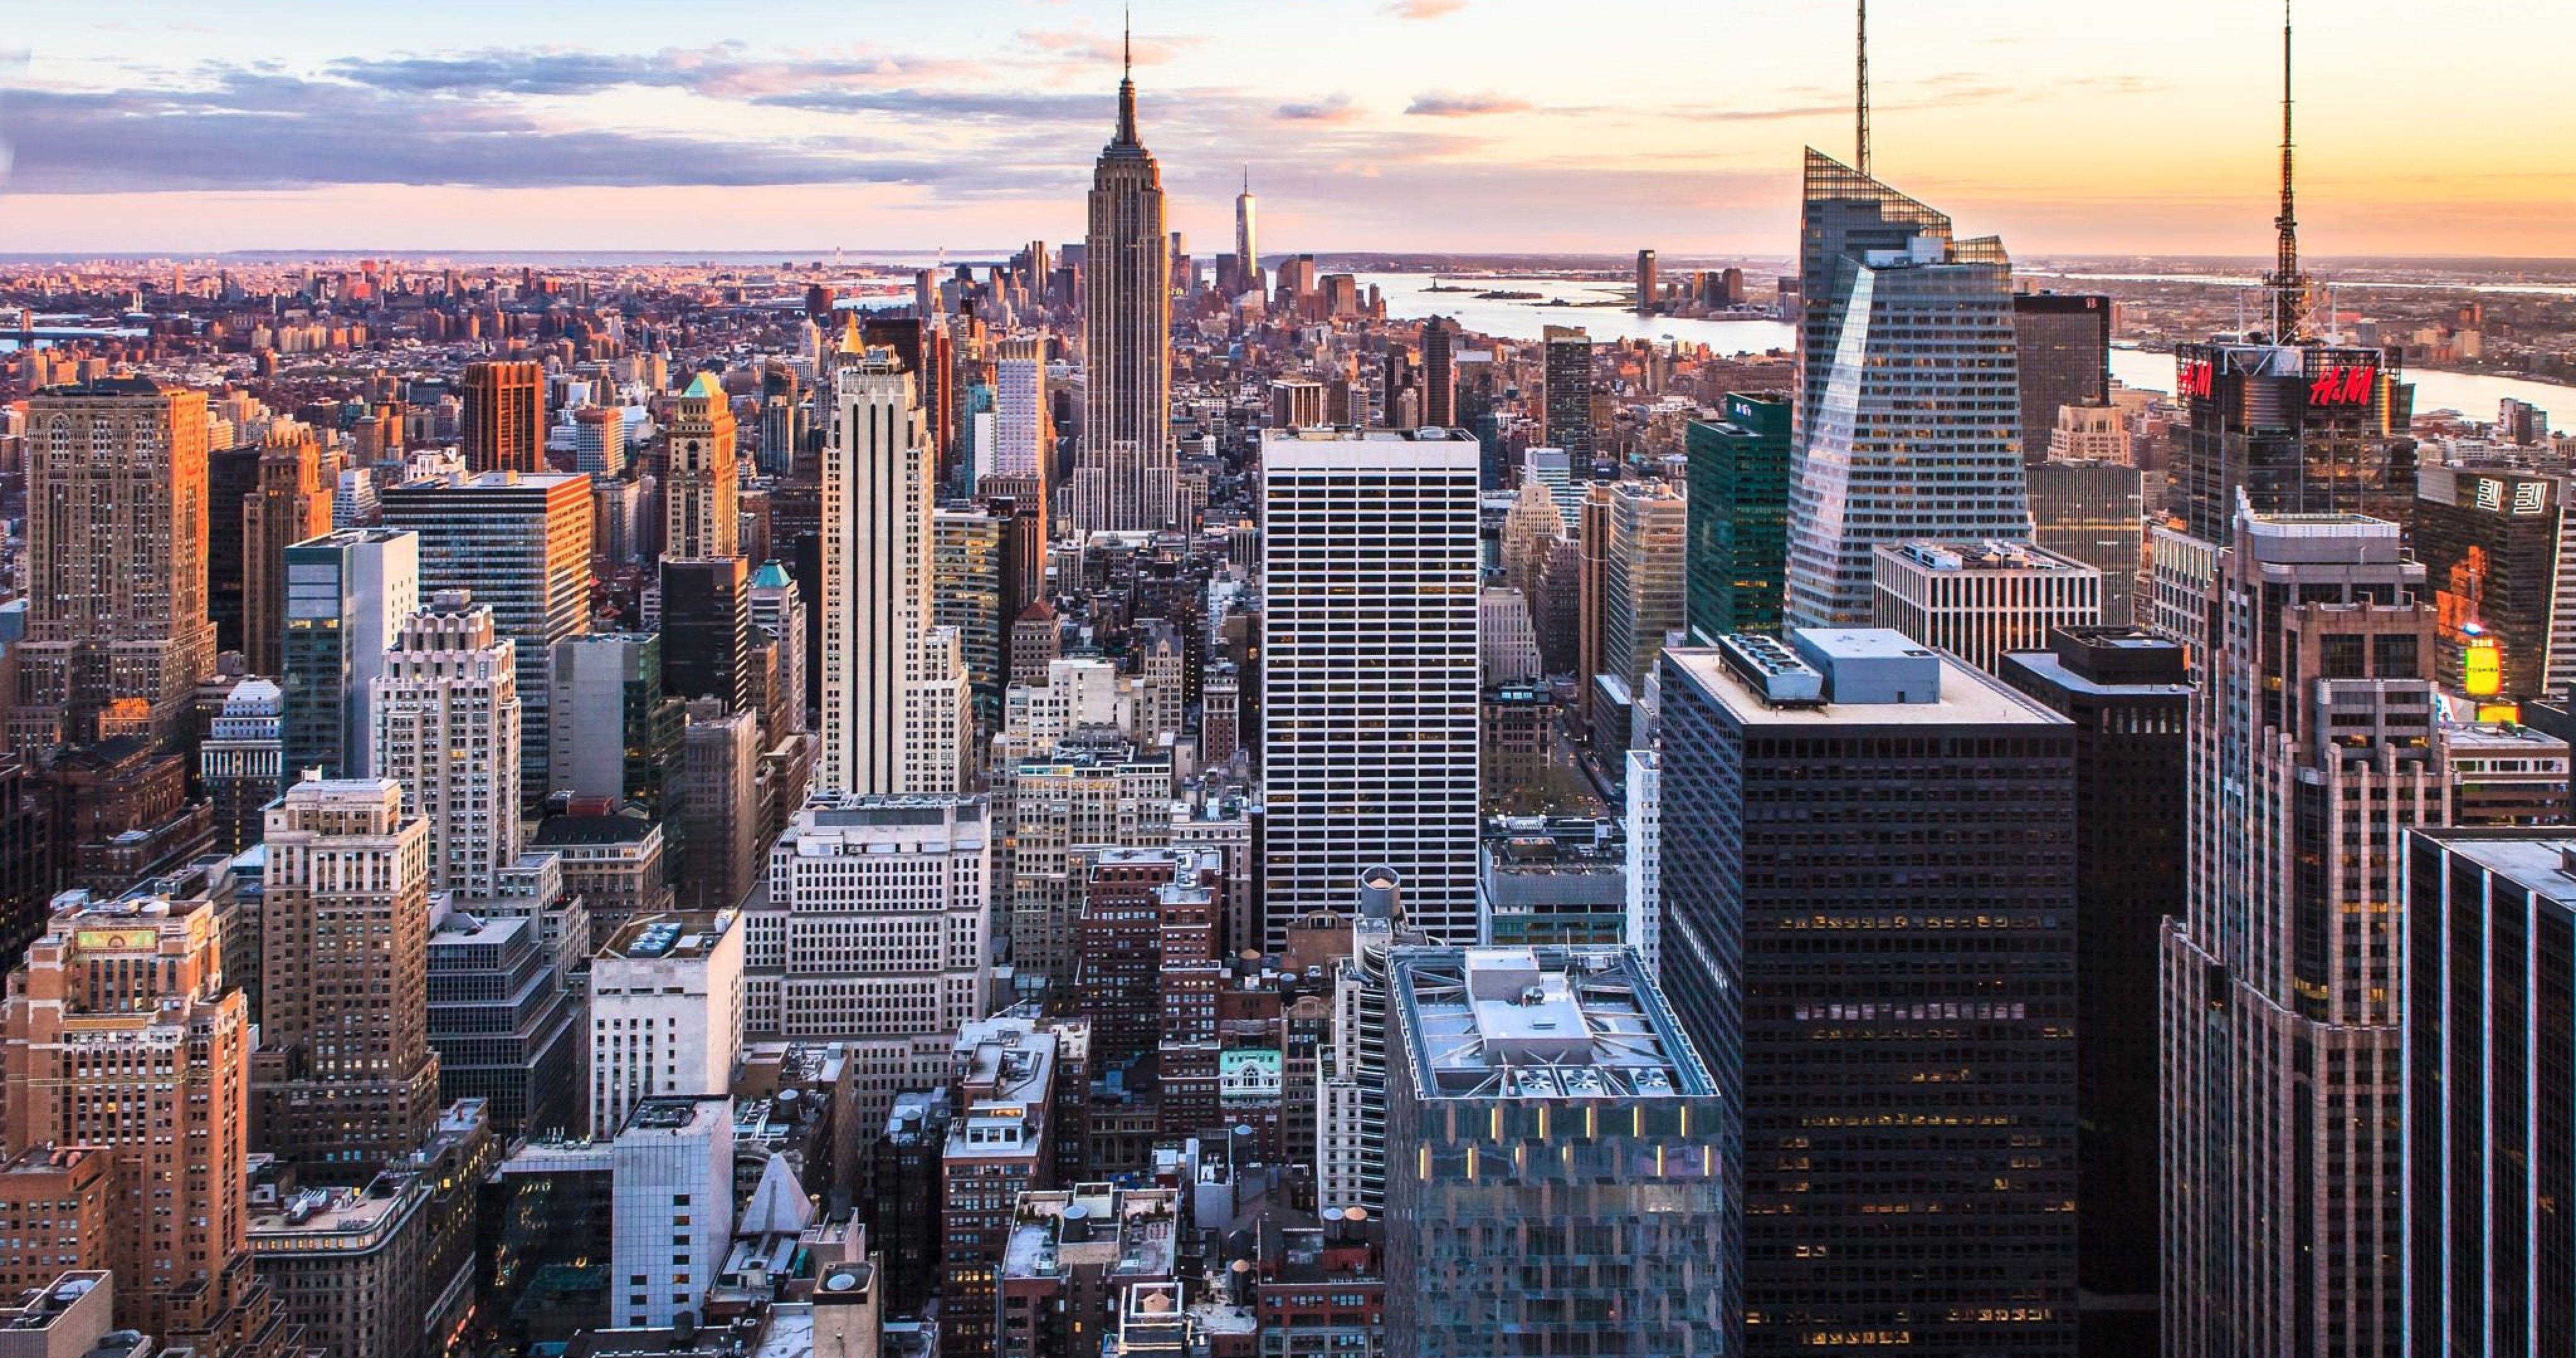 Ultra Hd New York Wallpaper 4k